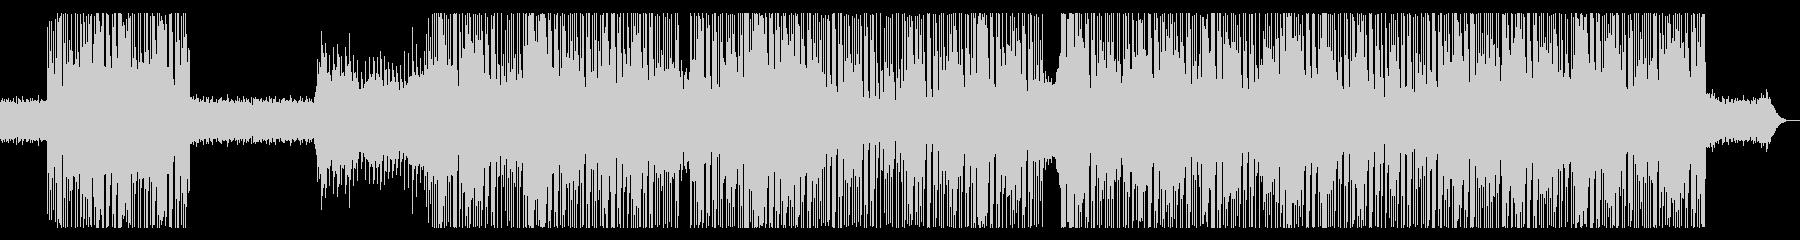 80s レトロ・シンセポップ、インストの未再生の波形